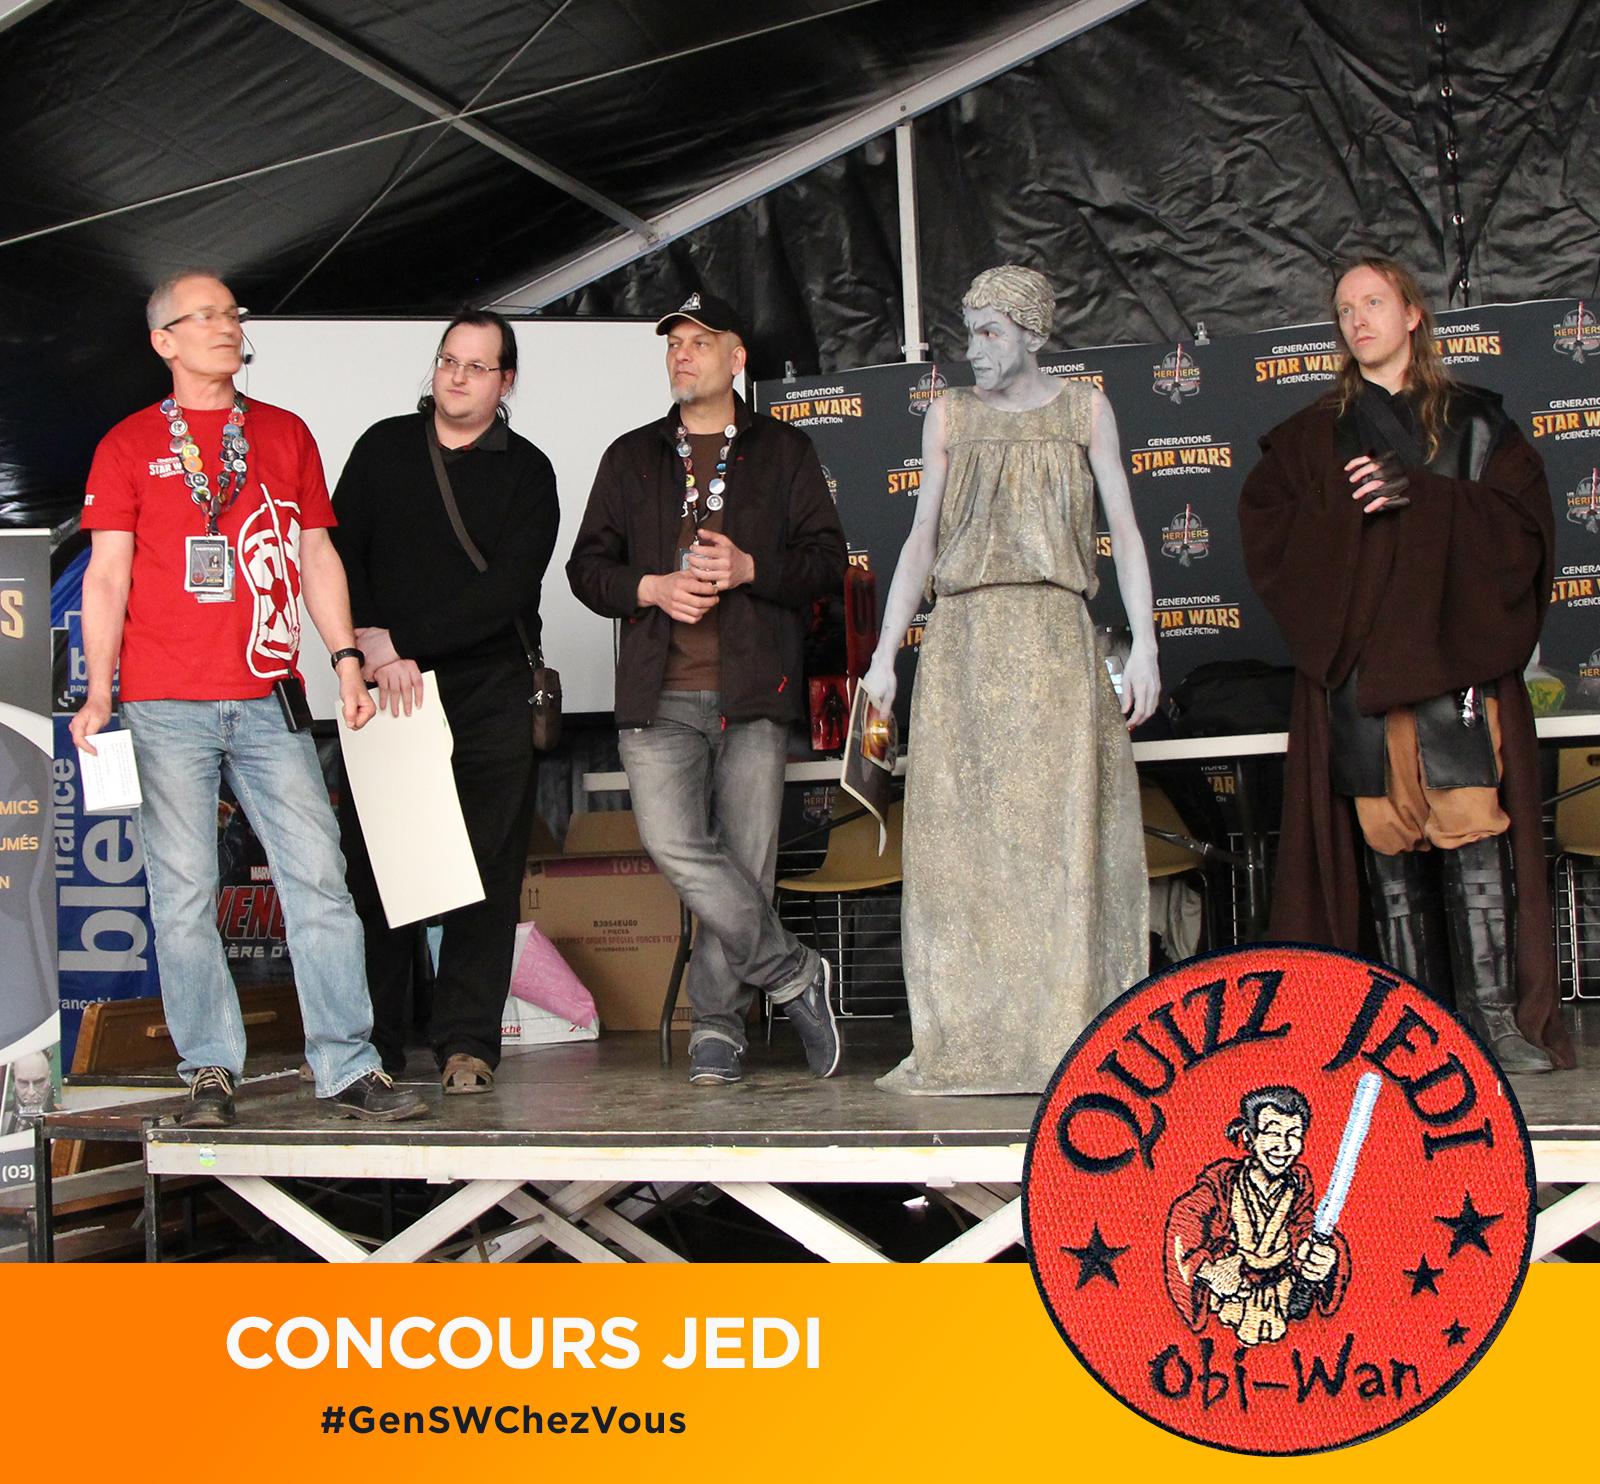 Concours_Jedi2020